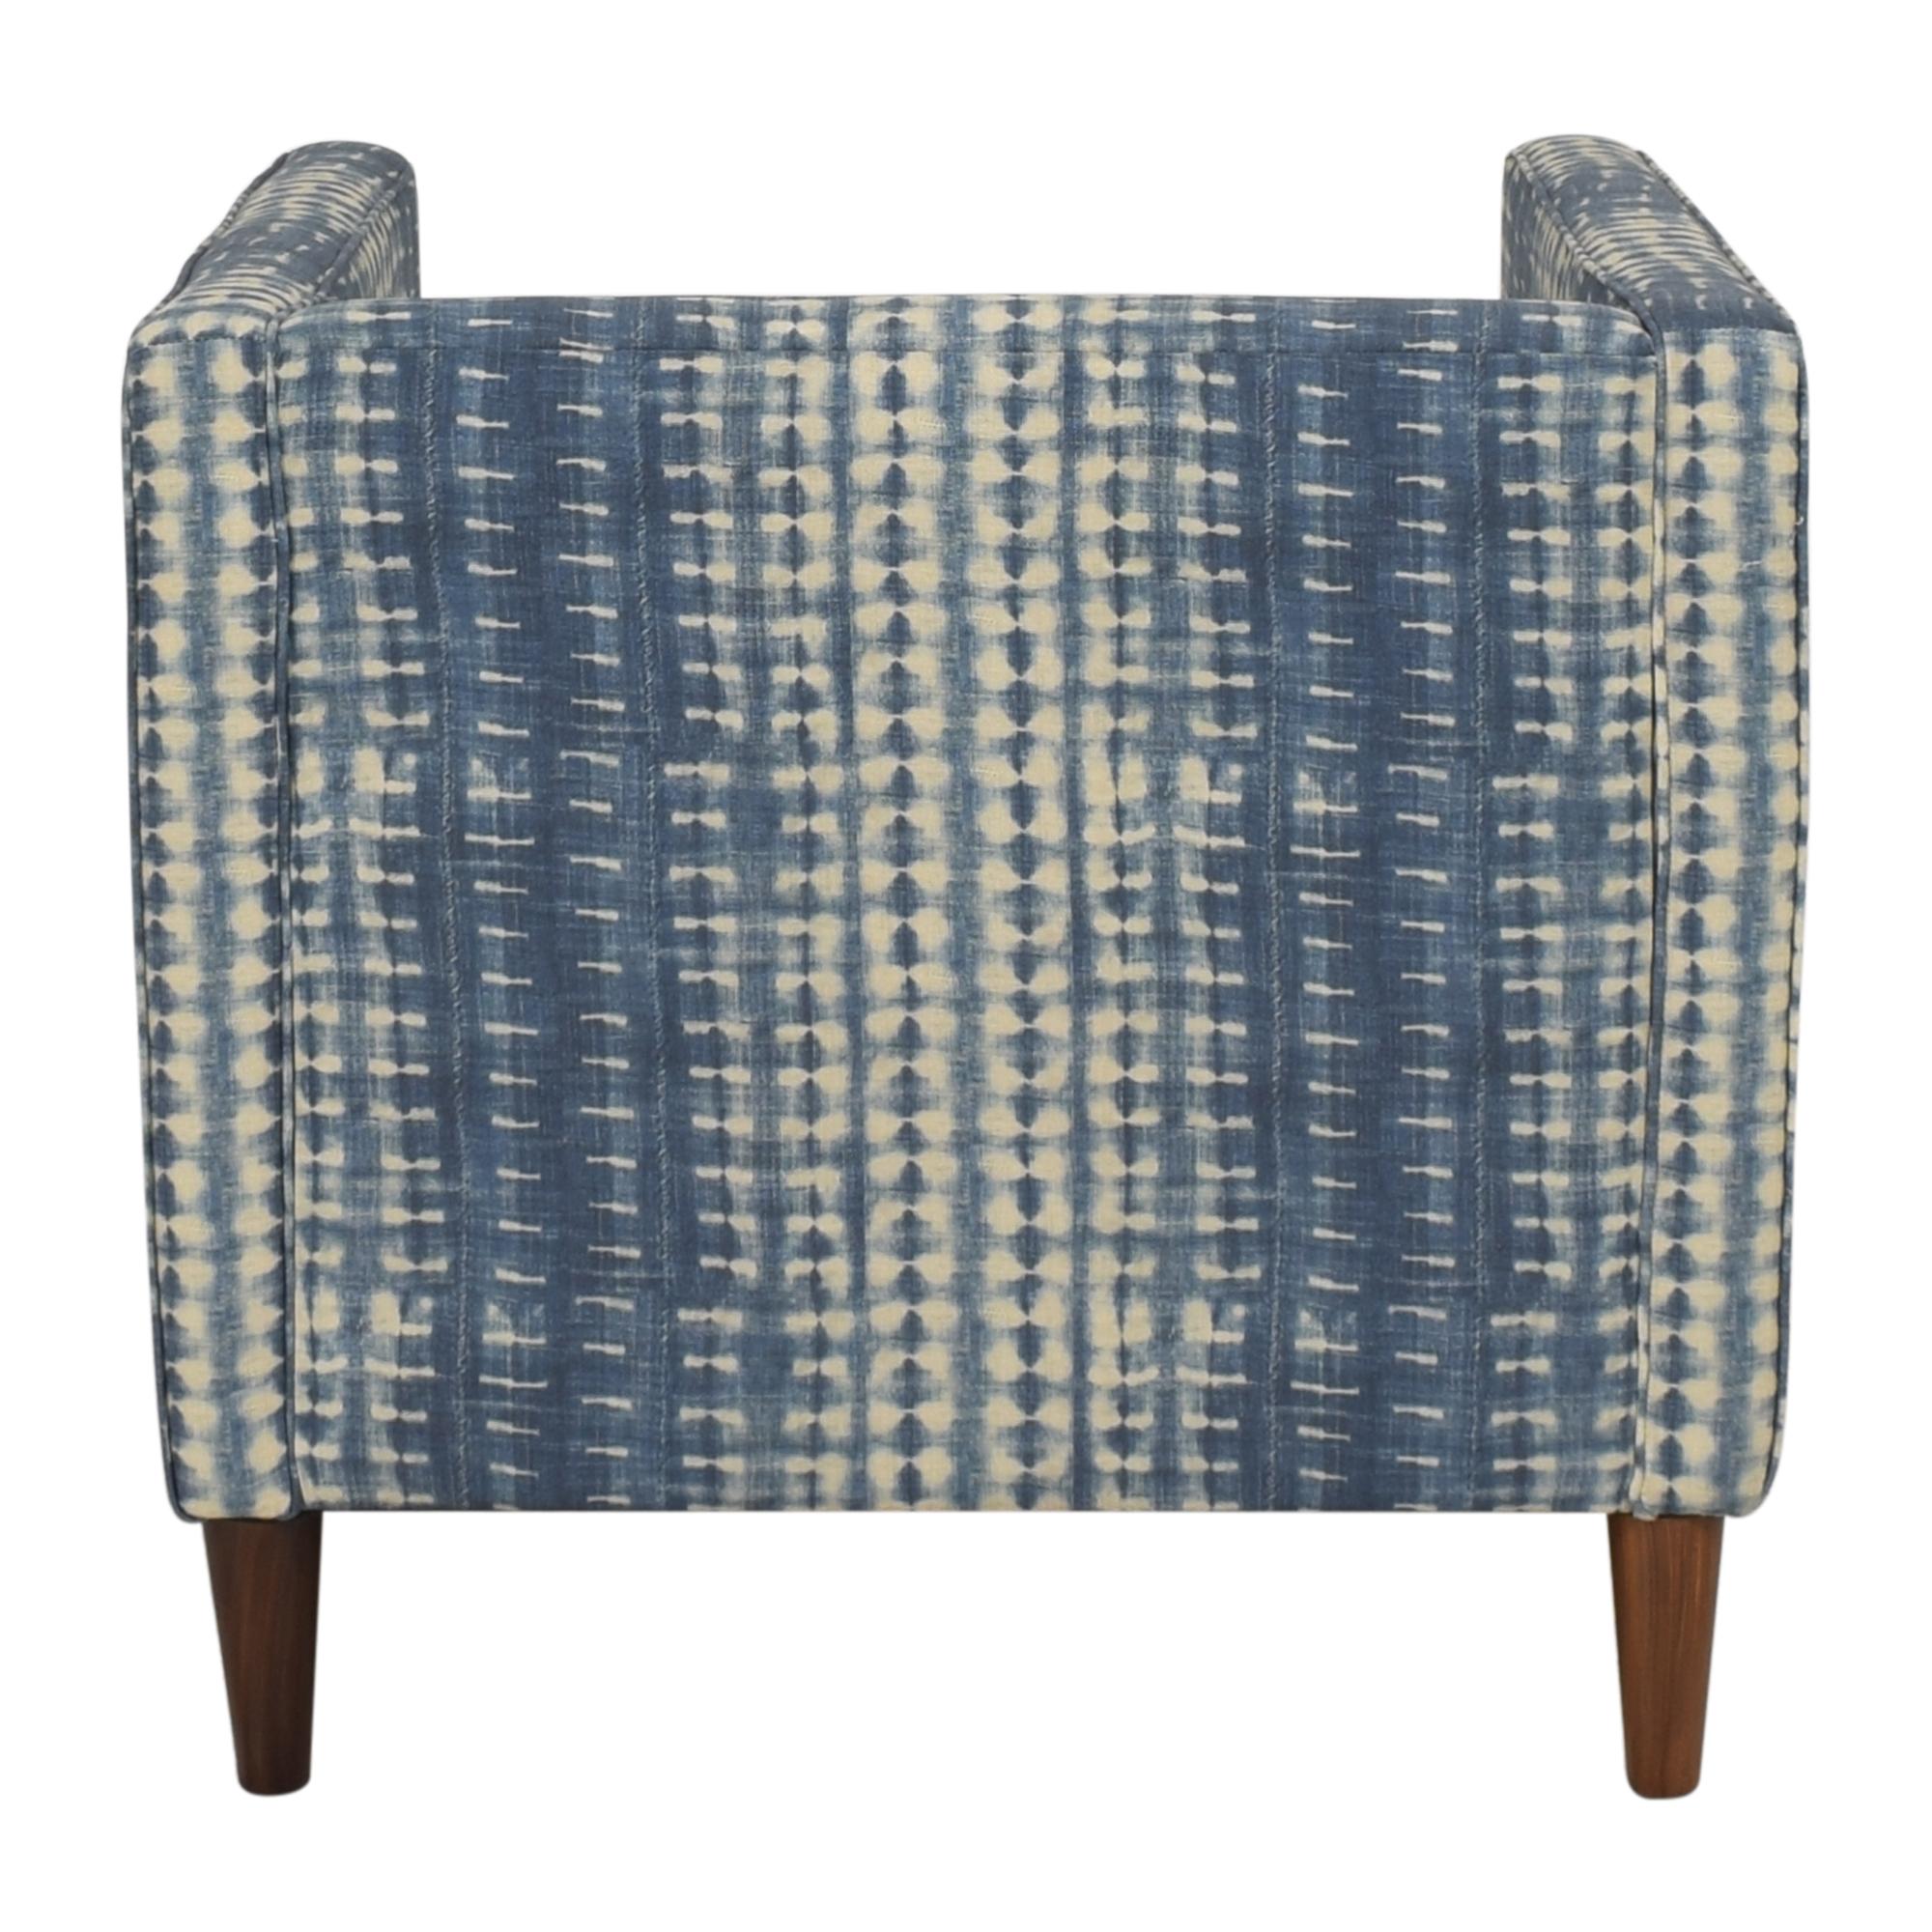 The Inside The Inside Shibori Tuxedo Chair Chairs